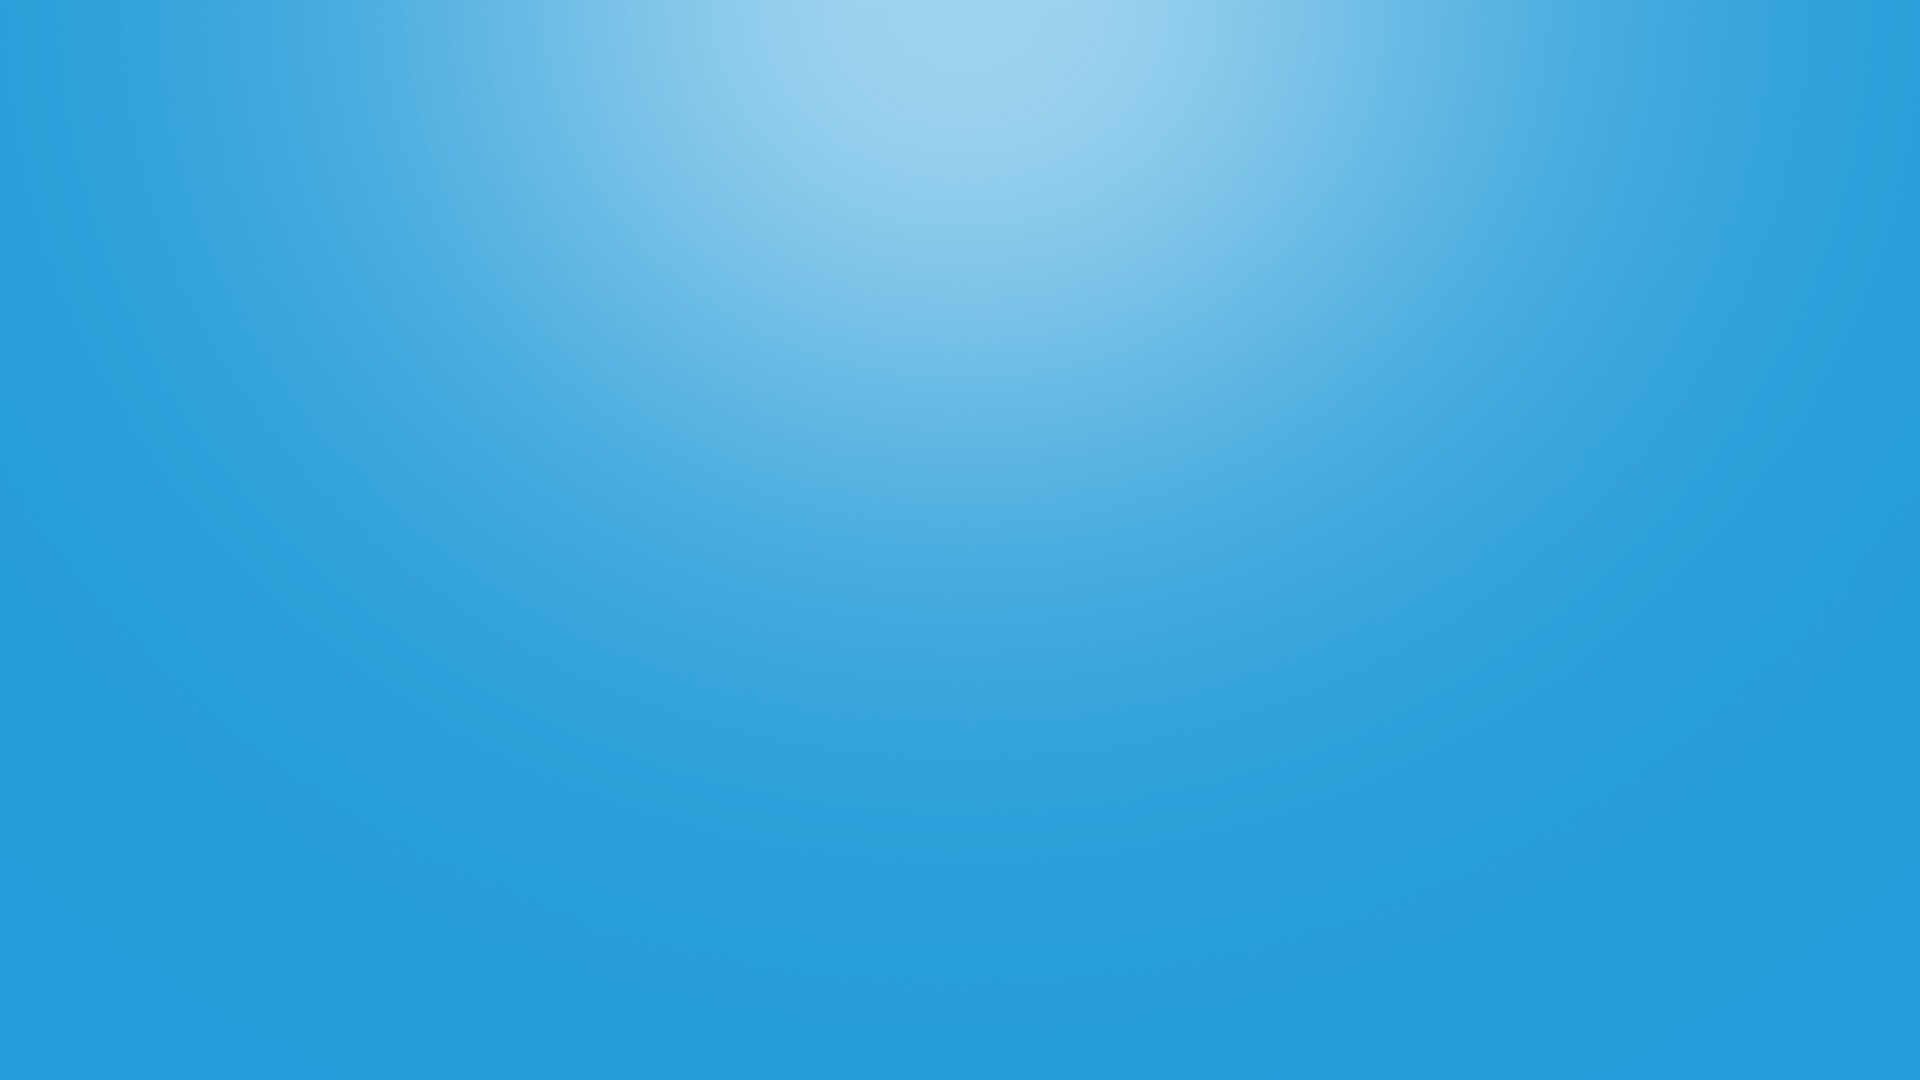 royal blue background  u00b7 u2460 download free hd wallpapers for